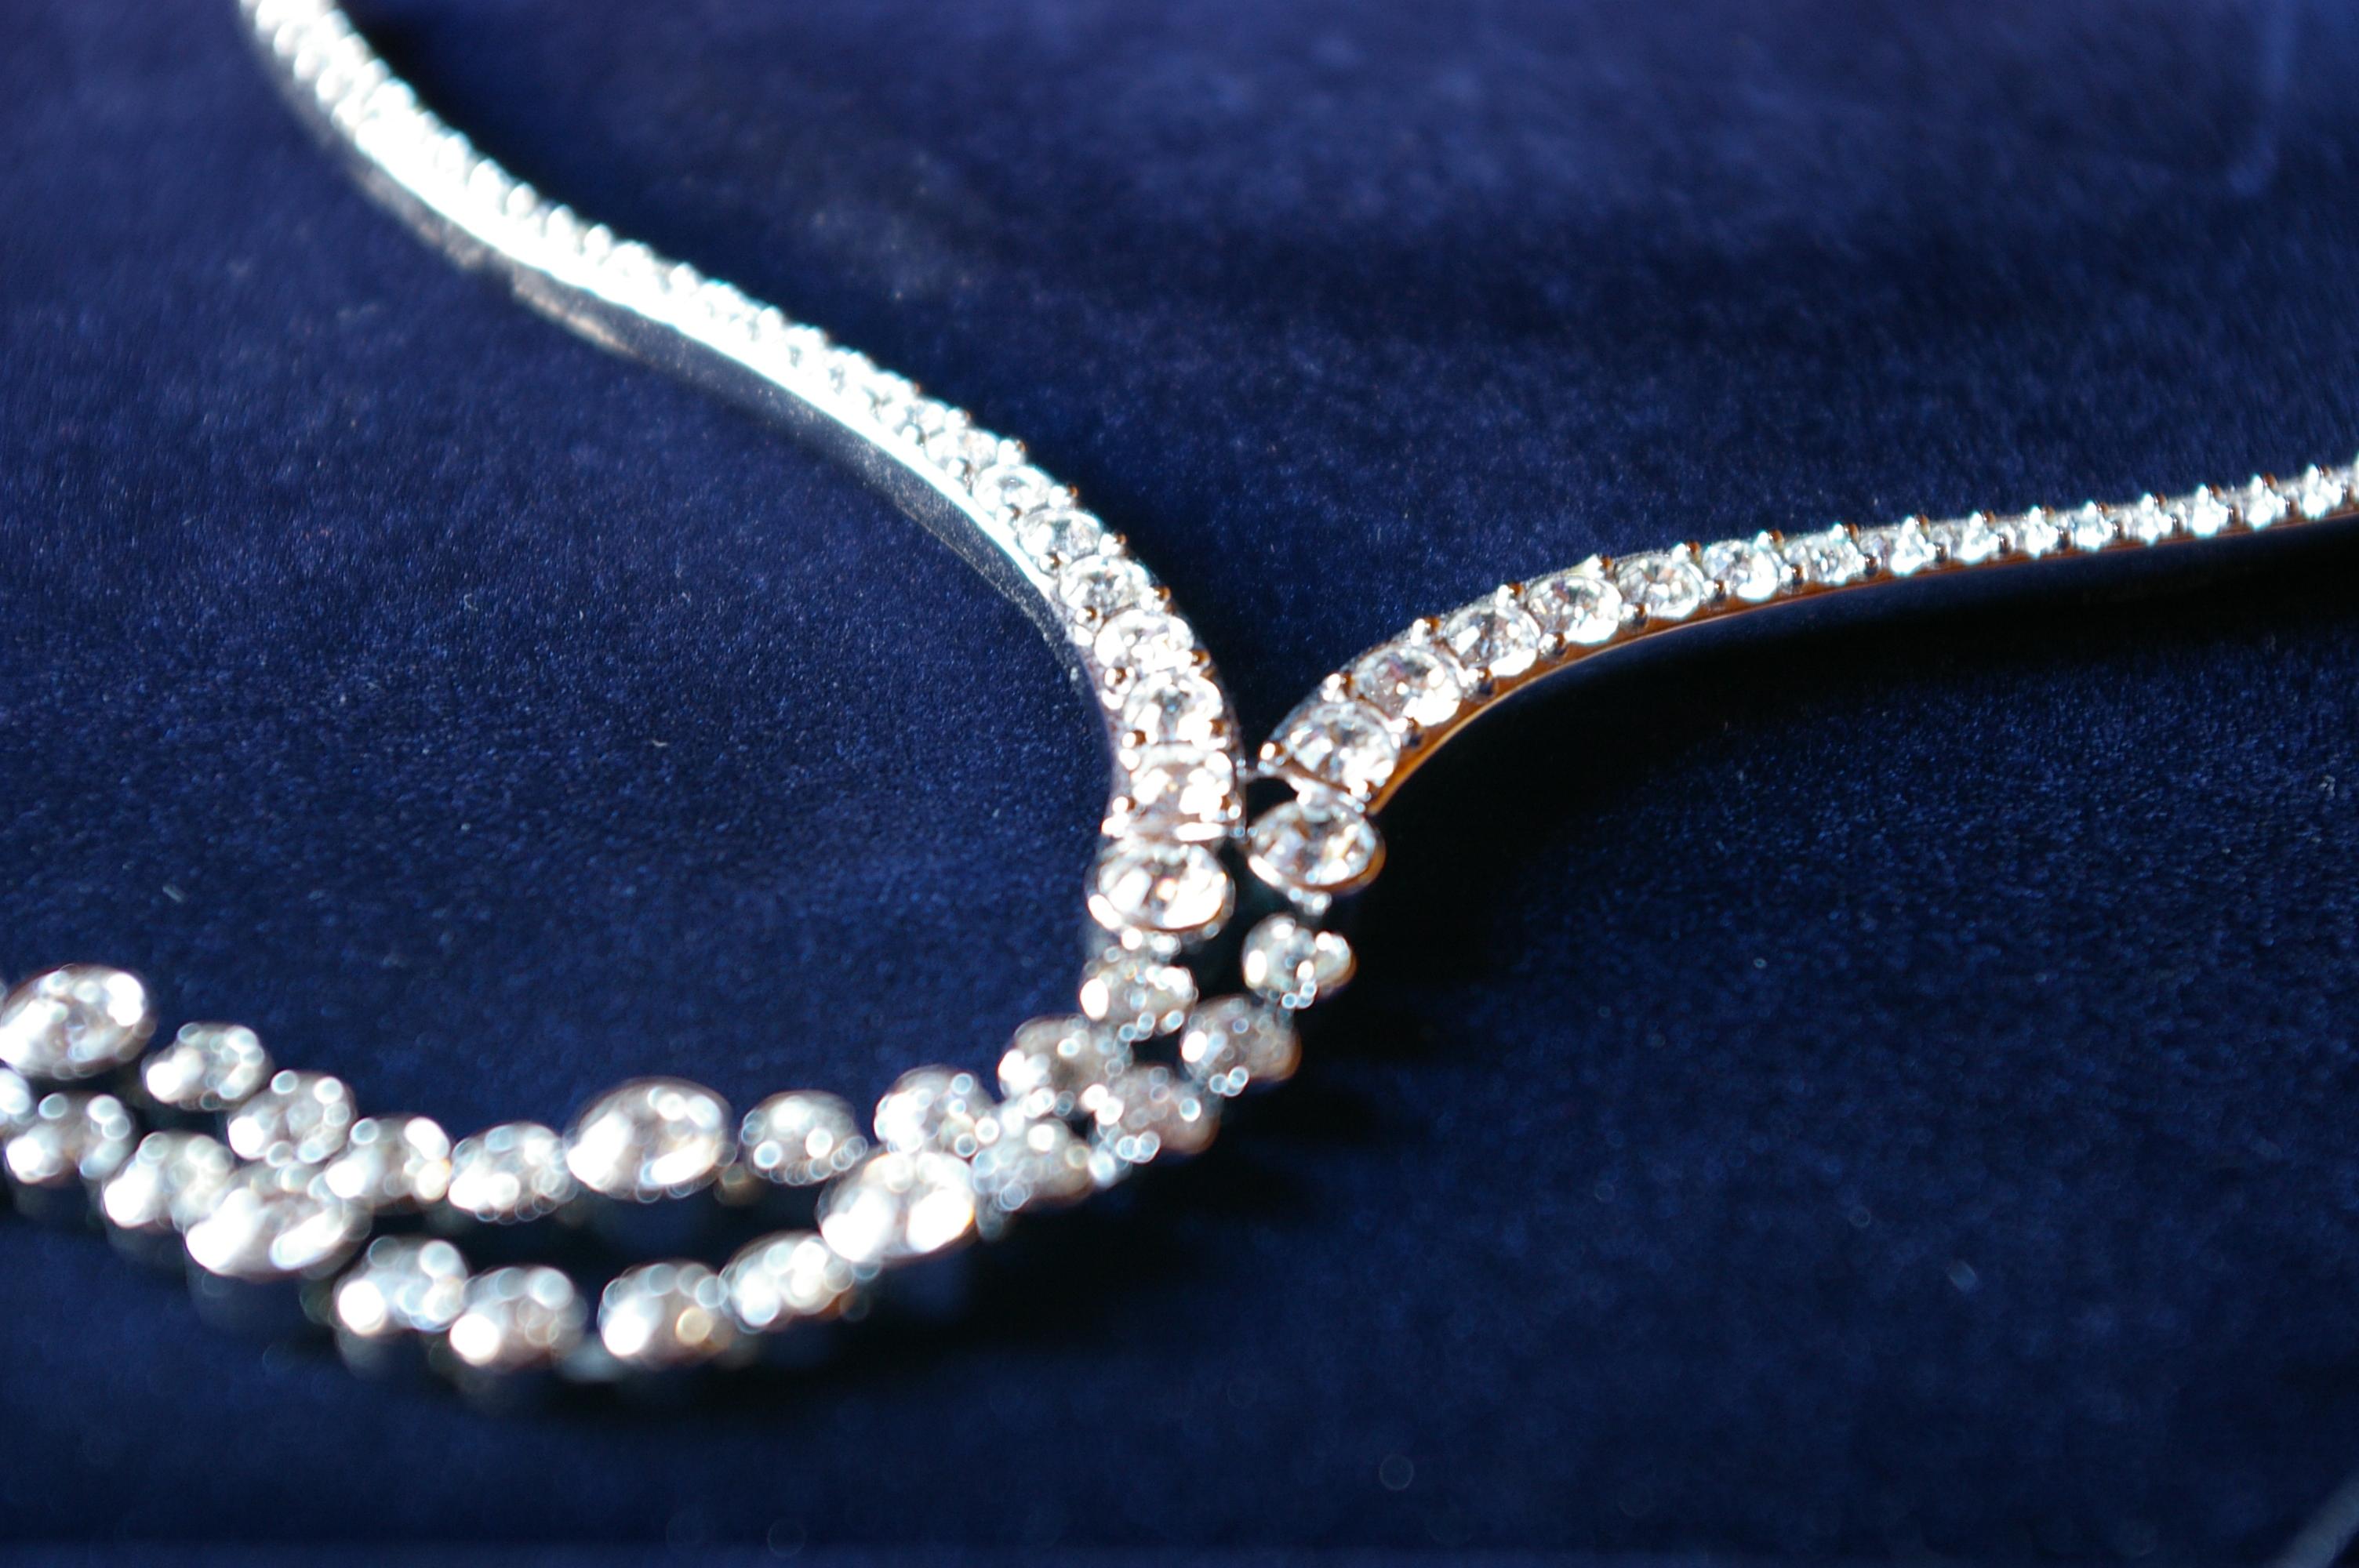 Diamond necklace, Beautiful, Beauty, Brilliant, Crystal, HQ Photo